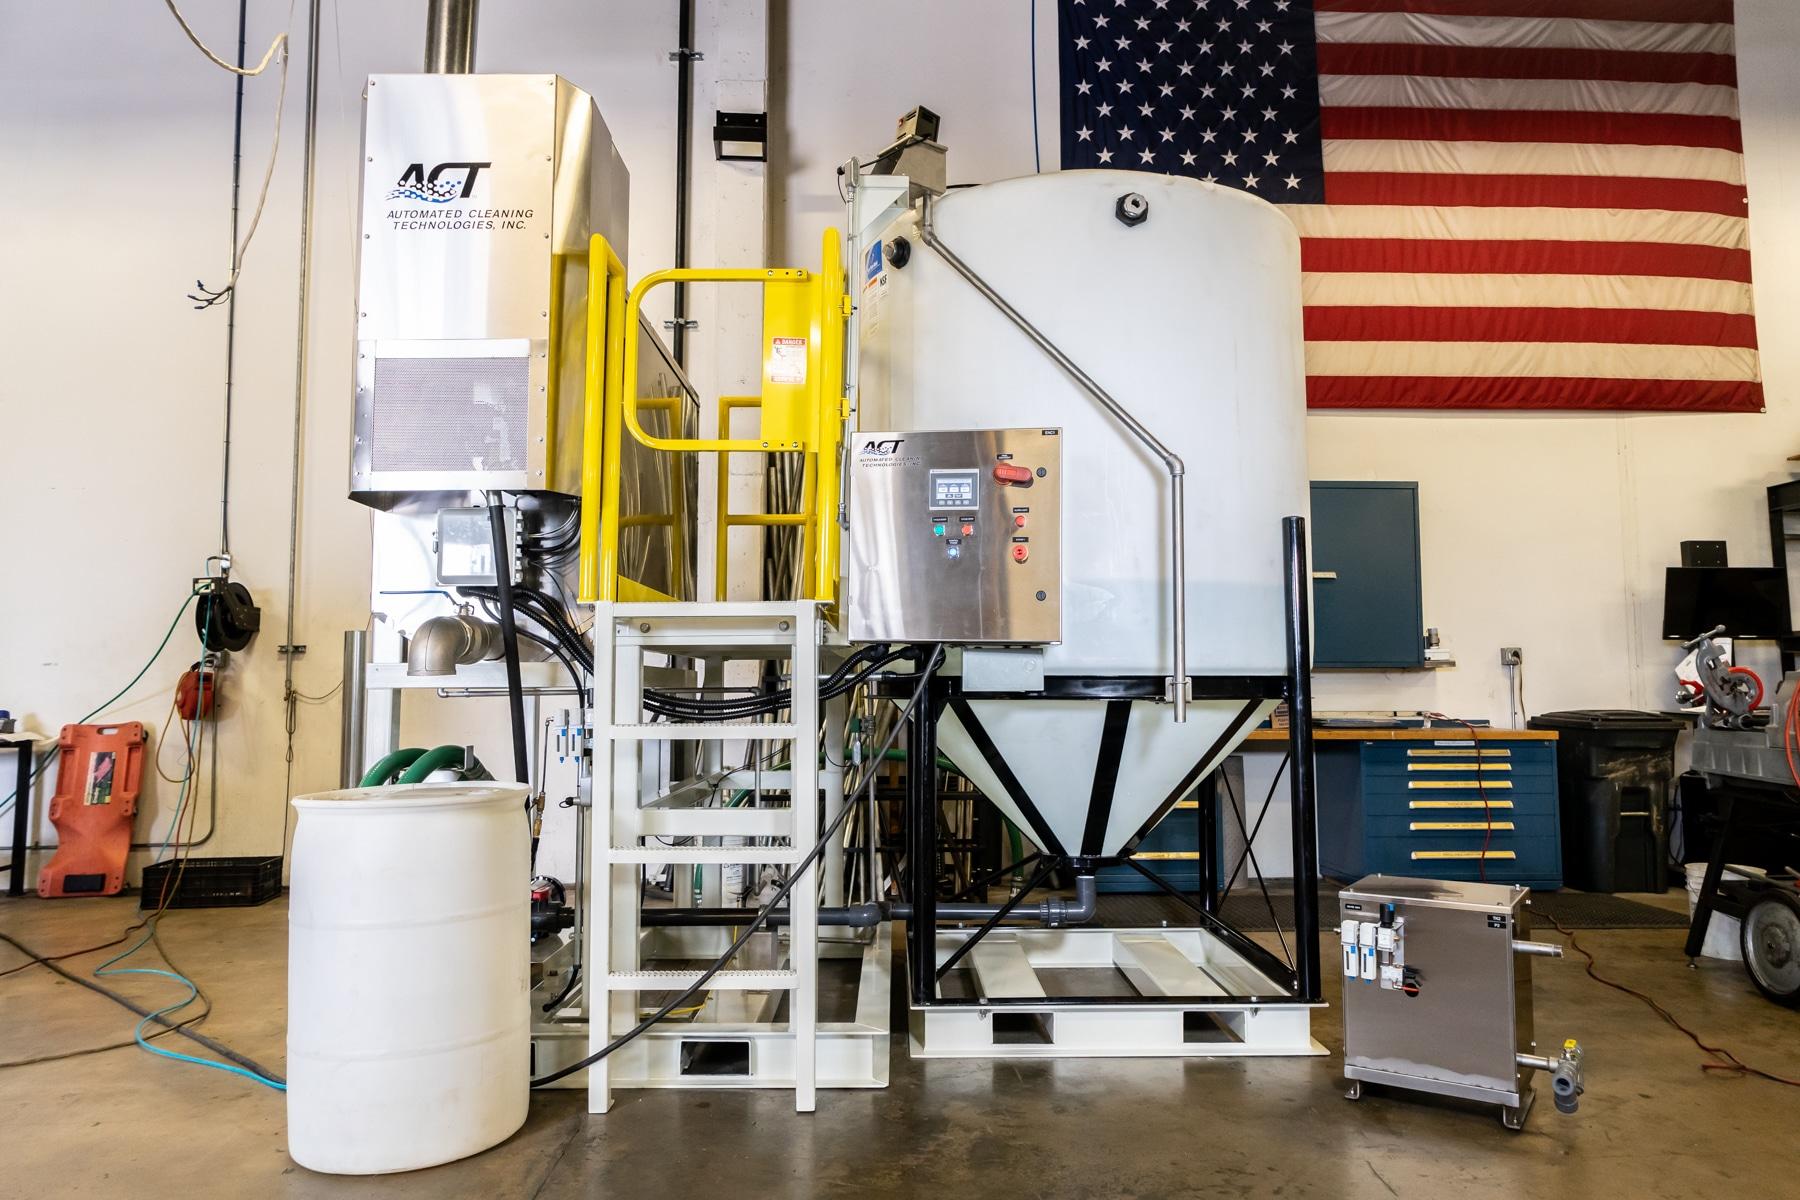 ACT-1800S-Industrial-Evaporators-Hi-Res-4